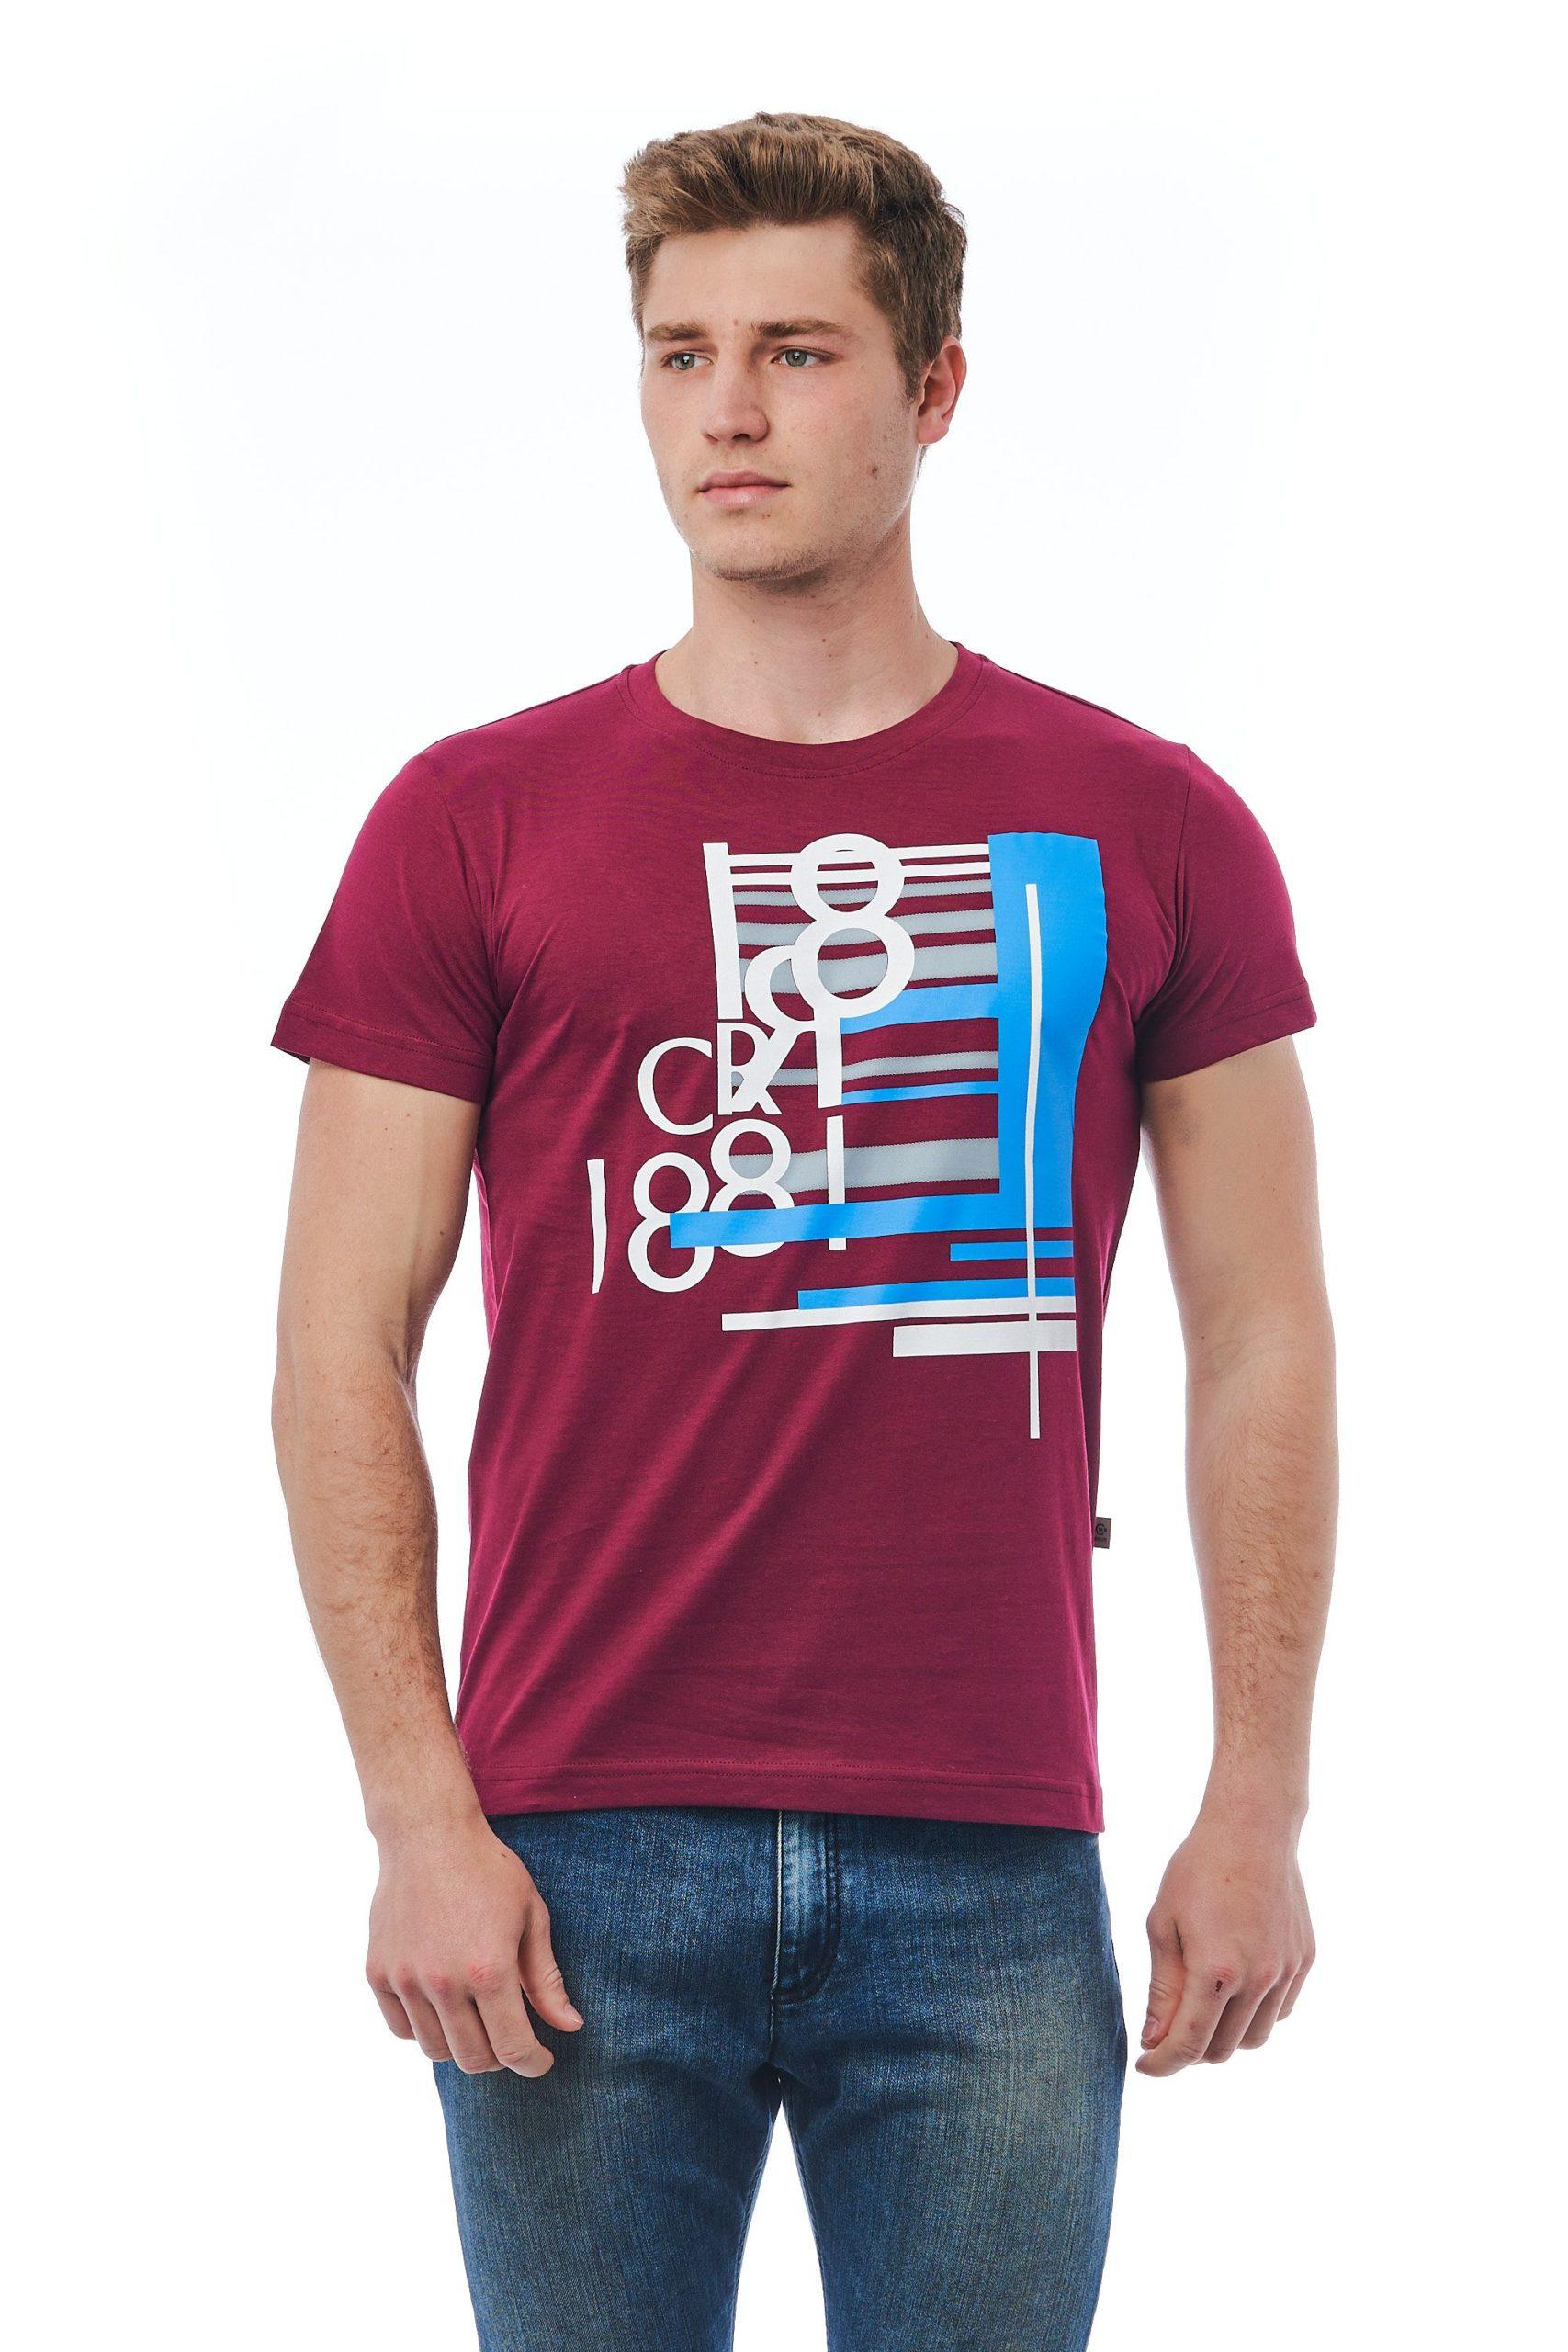 Cerruti 1881 Men's T-Shirt Burgundy CE1410095 - M